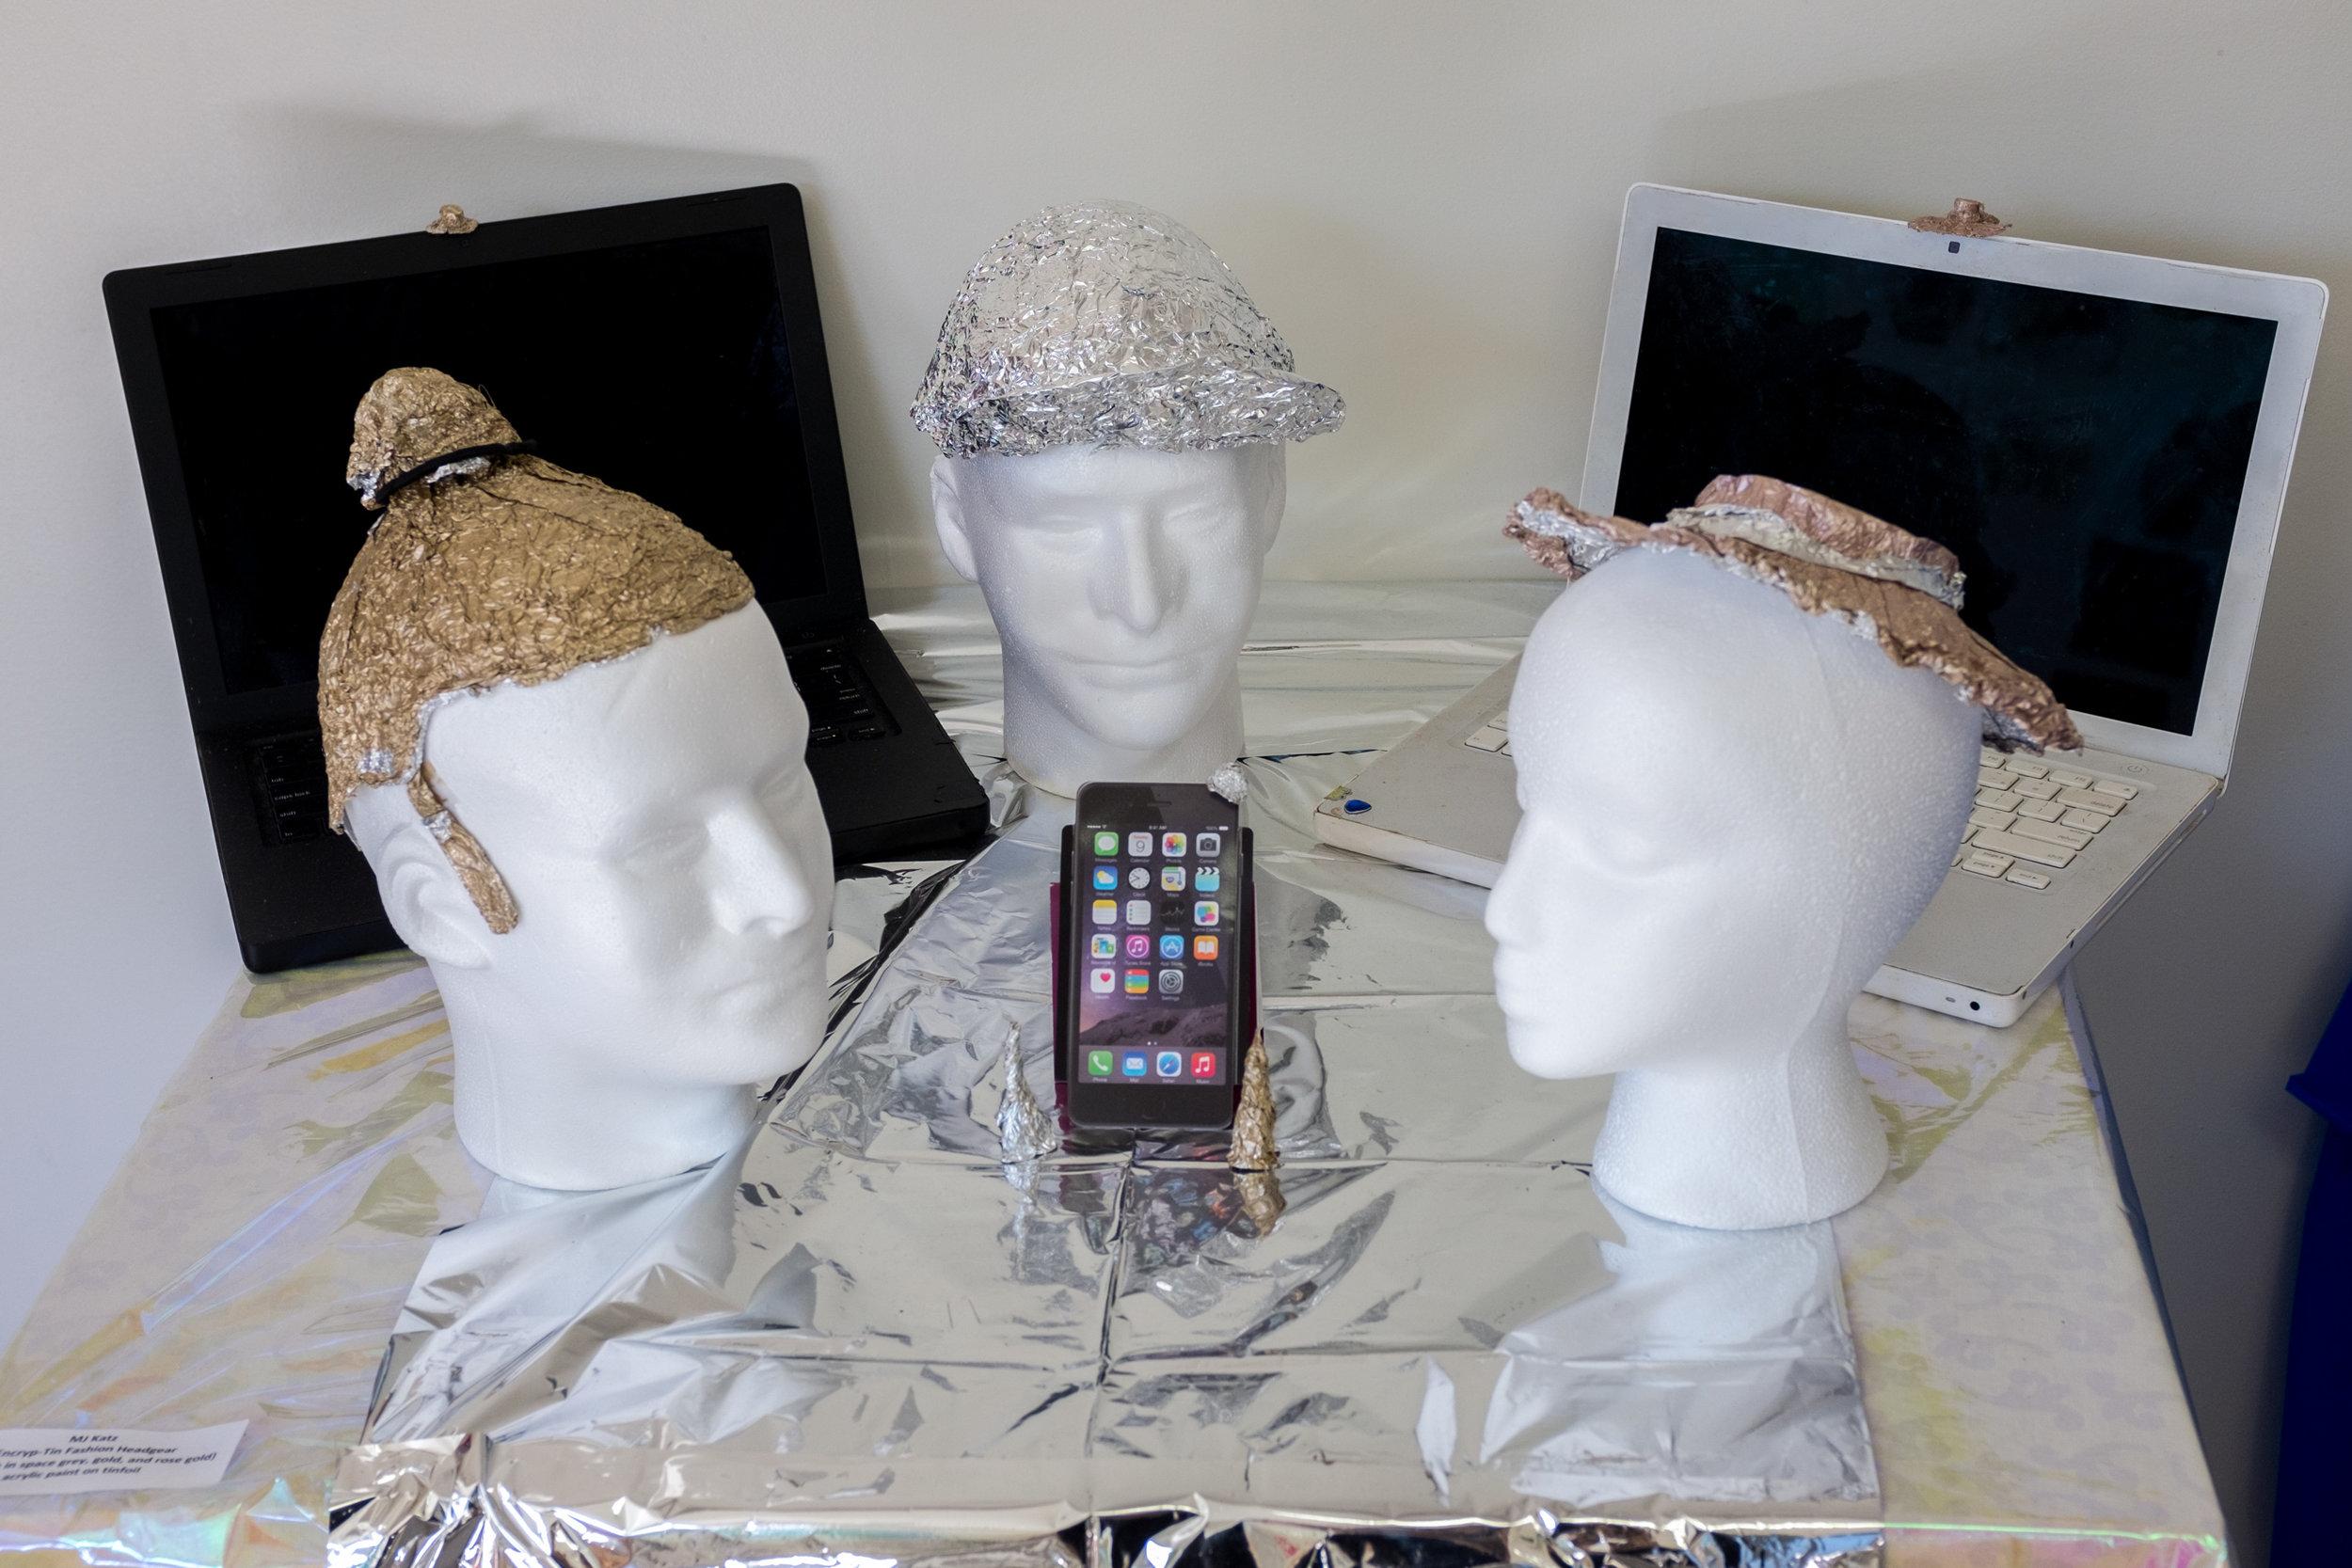 Precious Metals_MJ KATZ_003_Encryp-Tin Fashion Headgear_Available in Space Grey, Gold, and Rose Gold.jpg